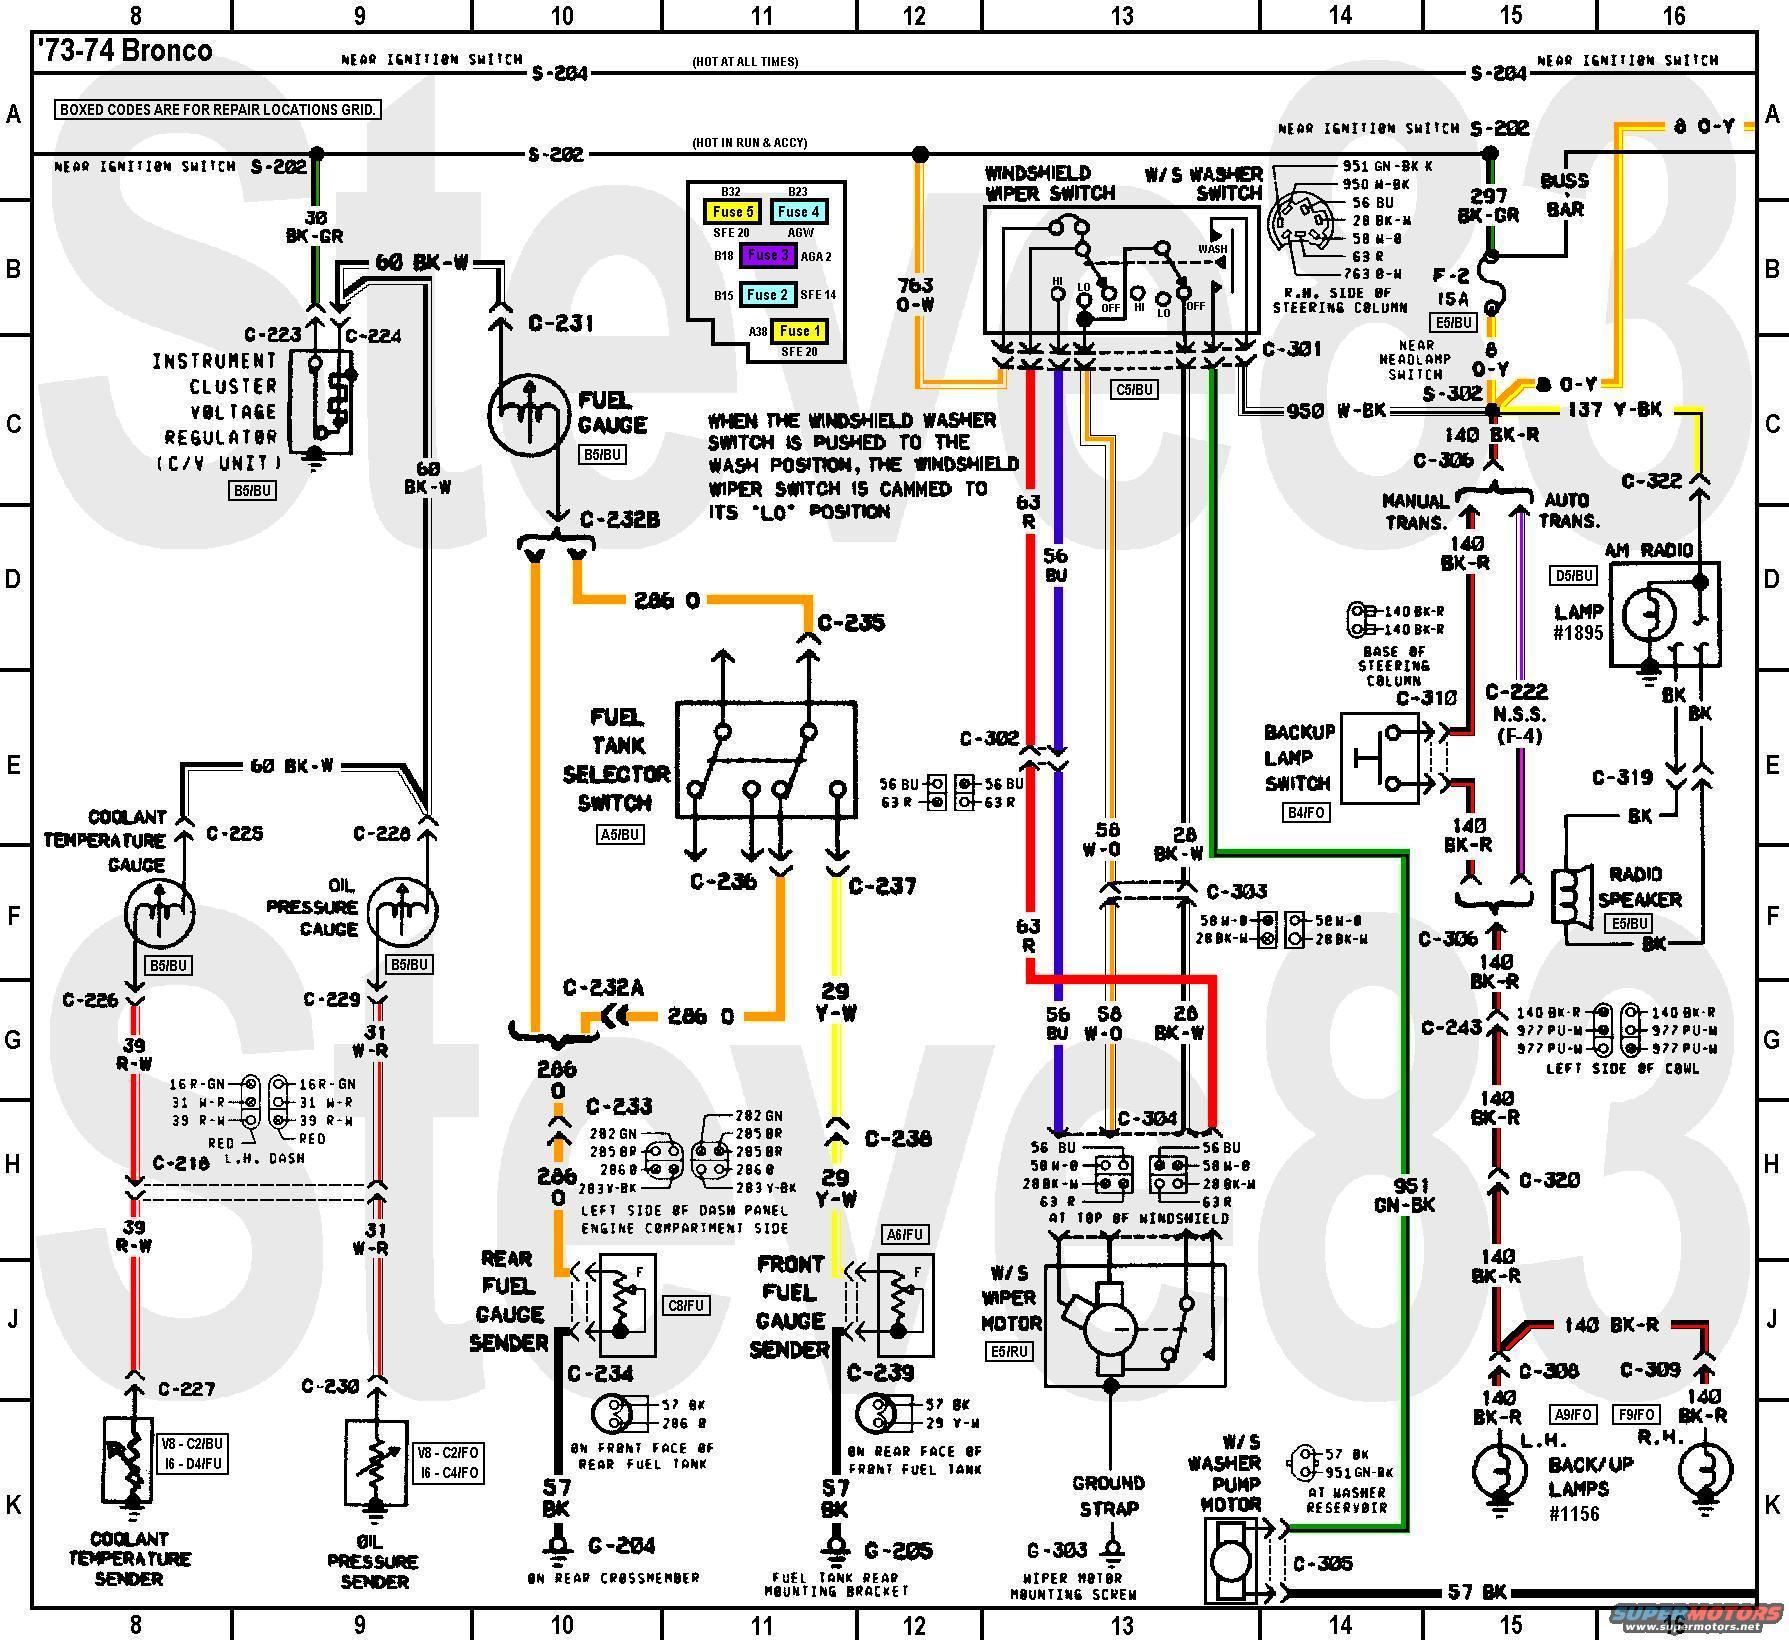 E38 Radio Wiring Diagram Expert Schematics 1977 Ford 2006 Mitsubishi Outlander Electrical Belt Eclipse